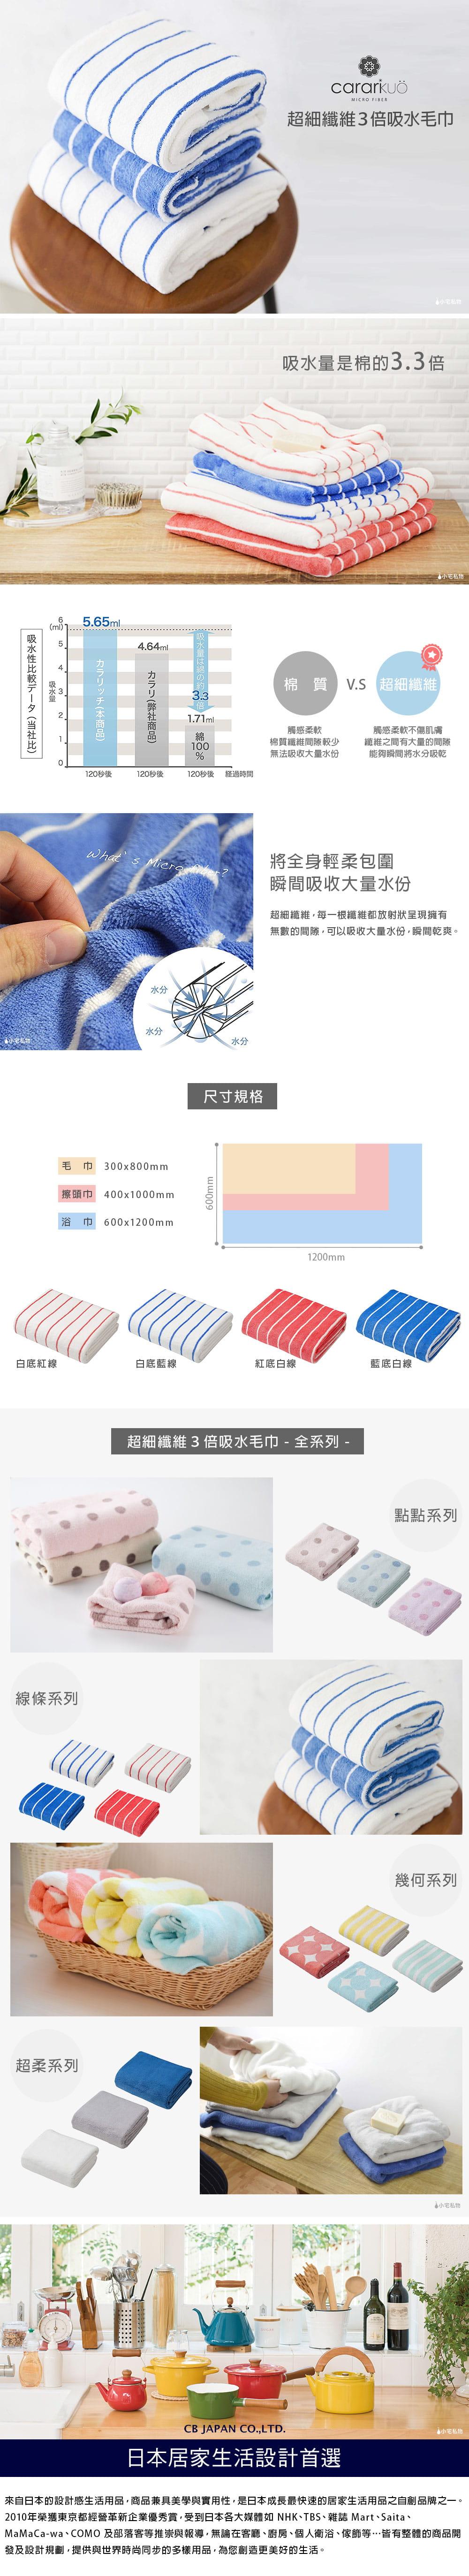 CB Japan 泡泡糖 線條系列 超細纖維3倍吸水擦頭巾 - 藍底白線